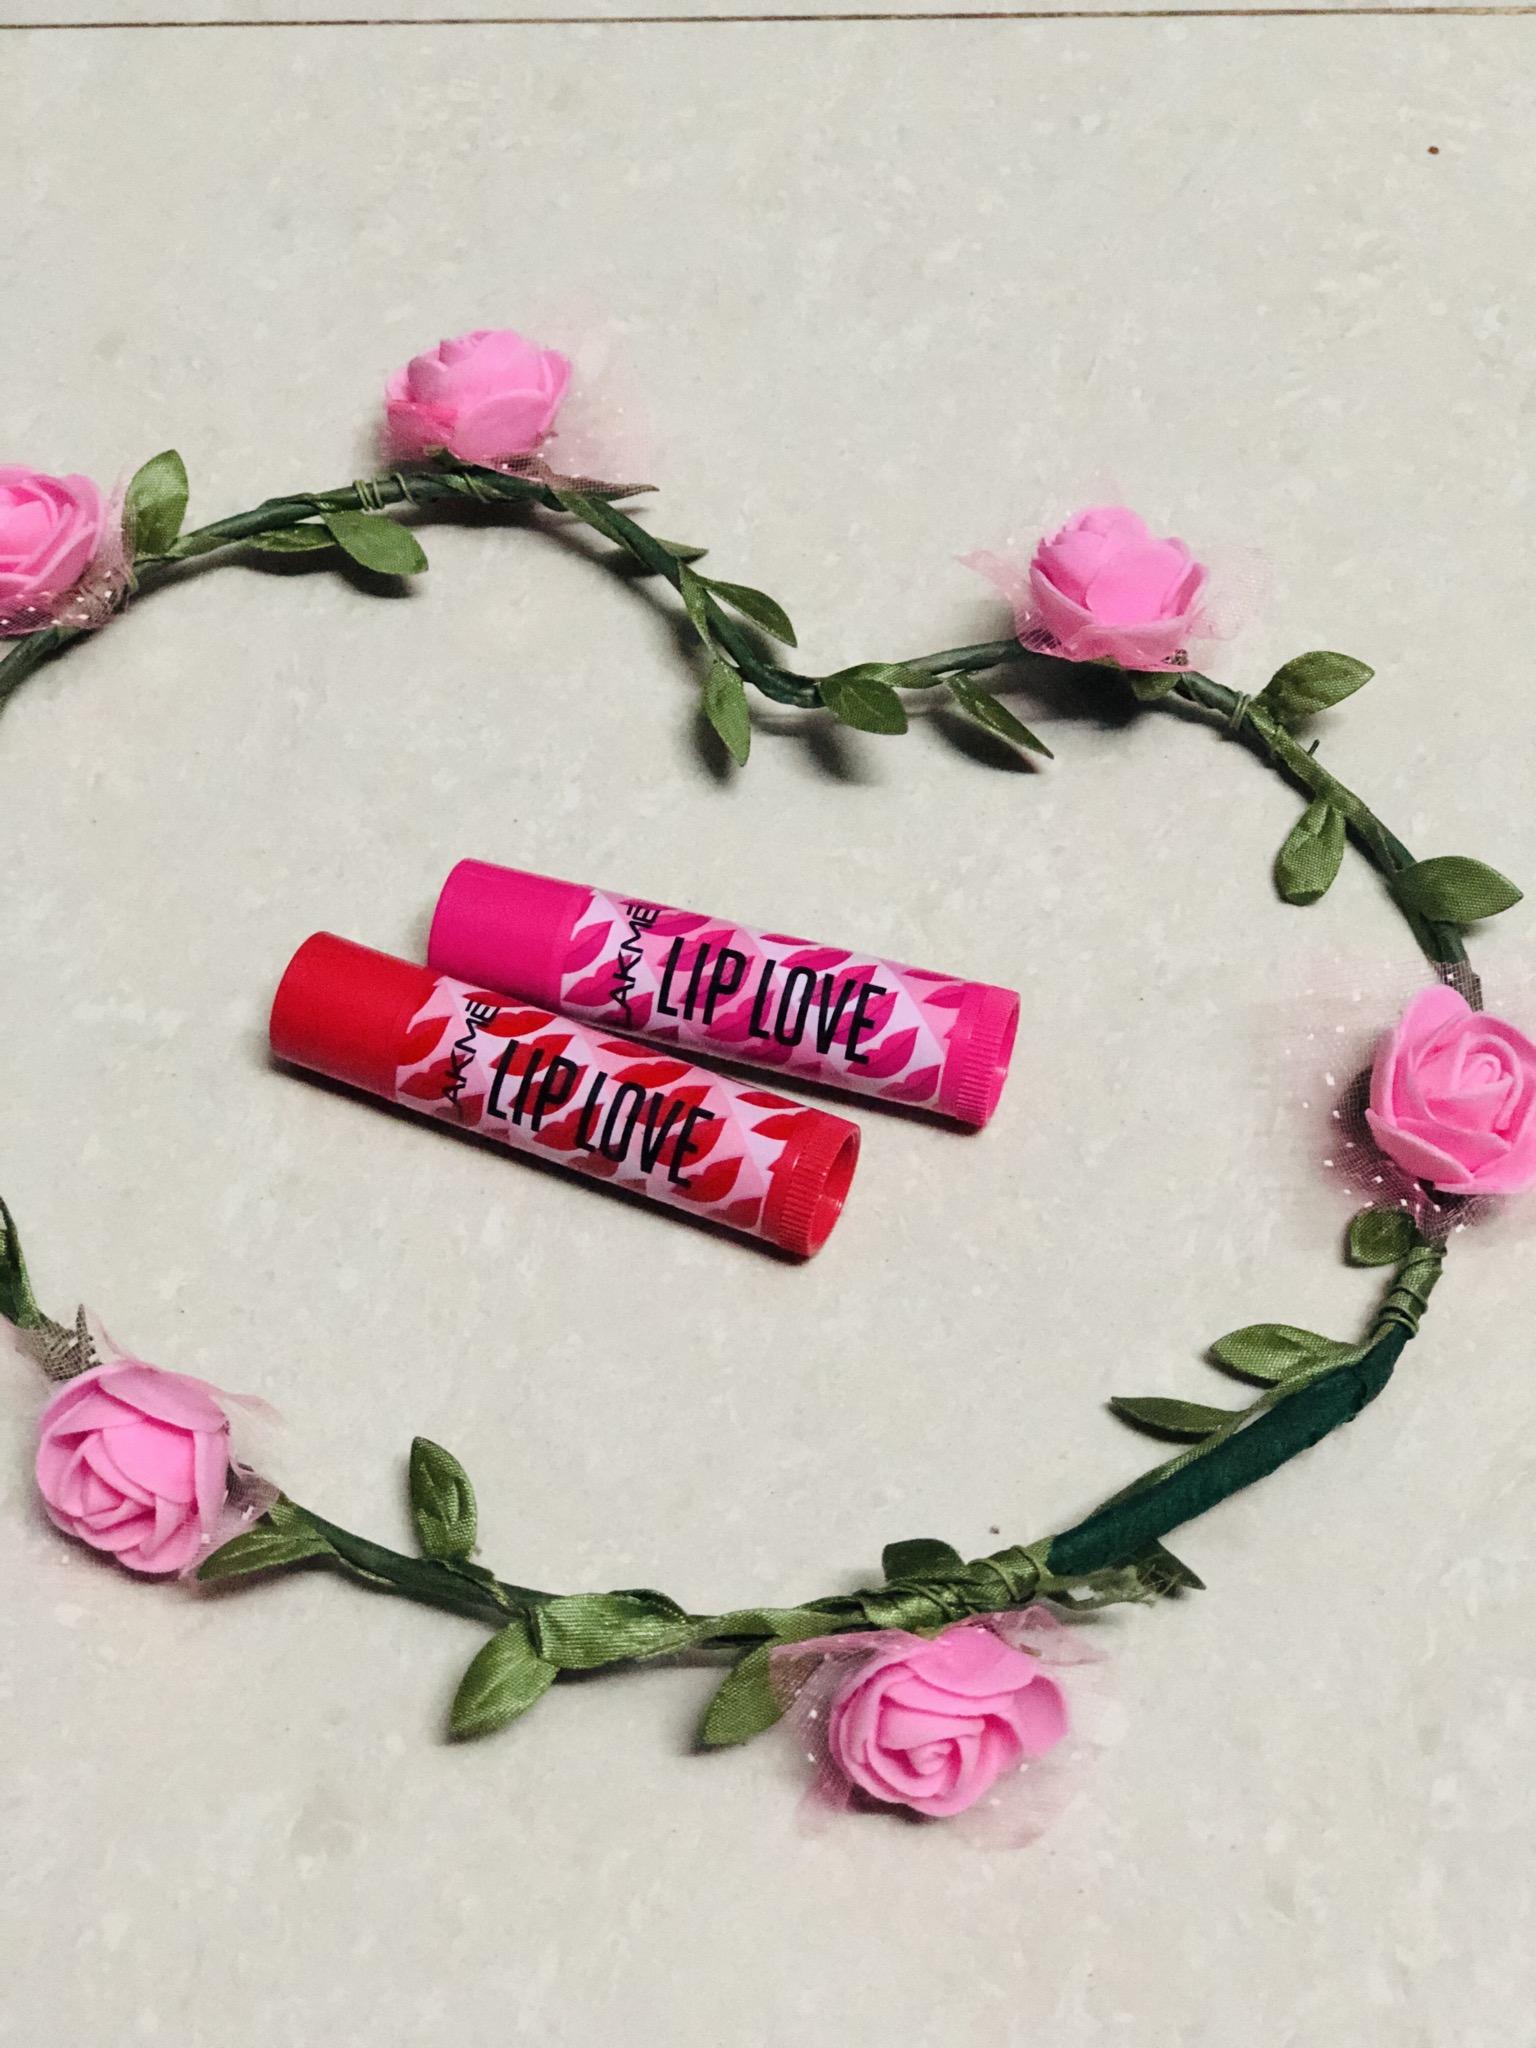 Lakme Lip Love Chapstick-In love with lakme lip love Chapstick-By divyakiran